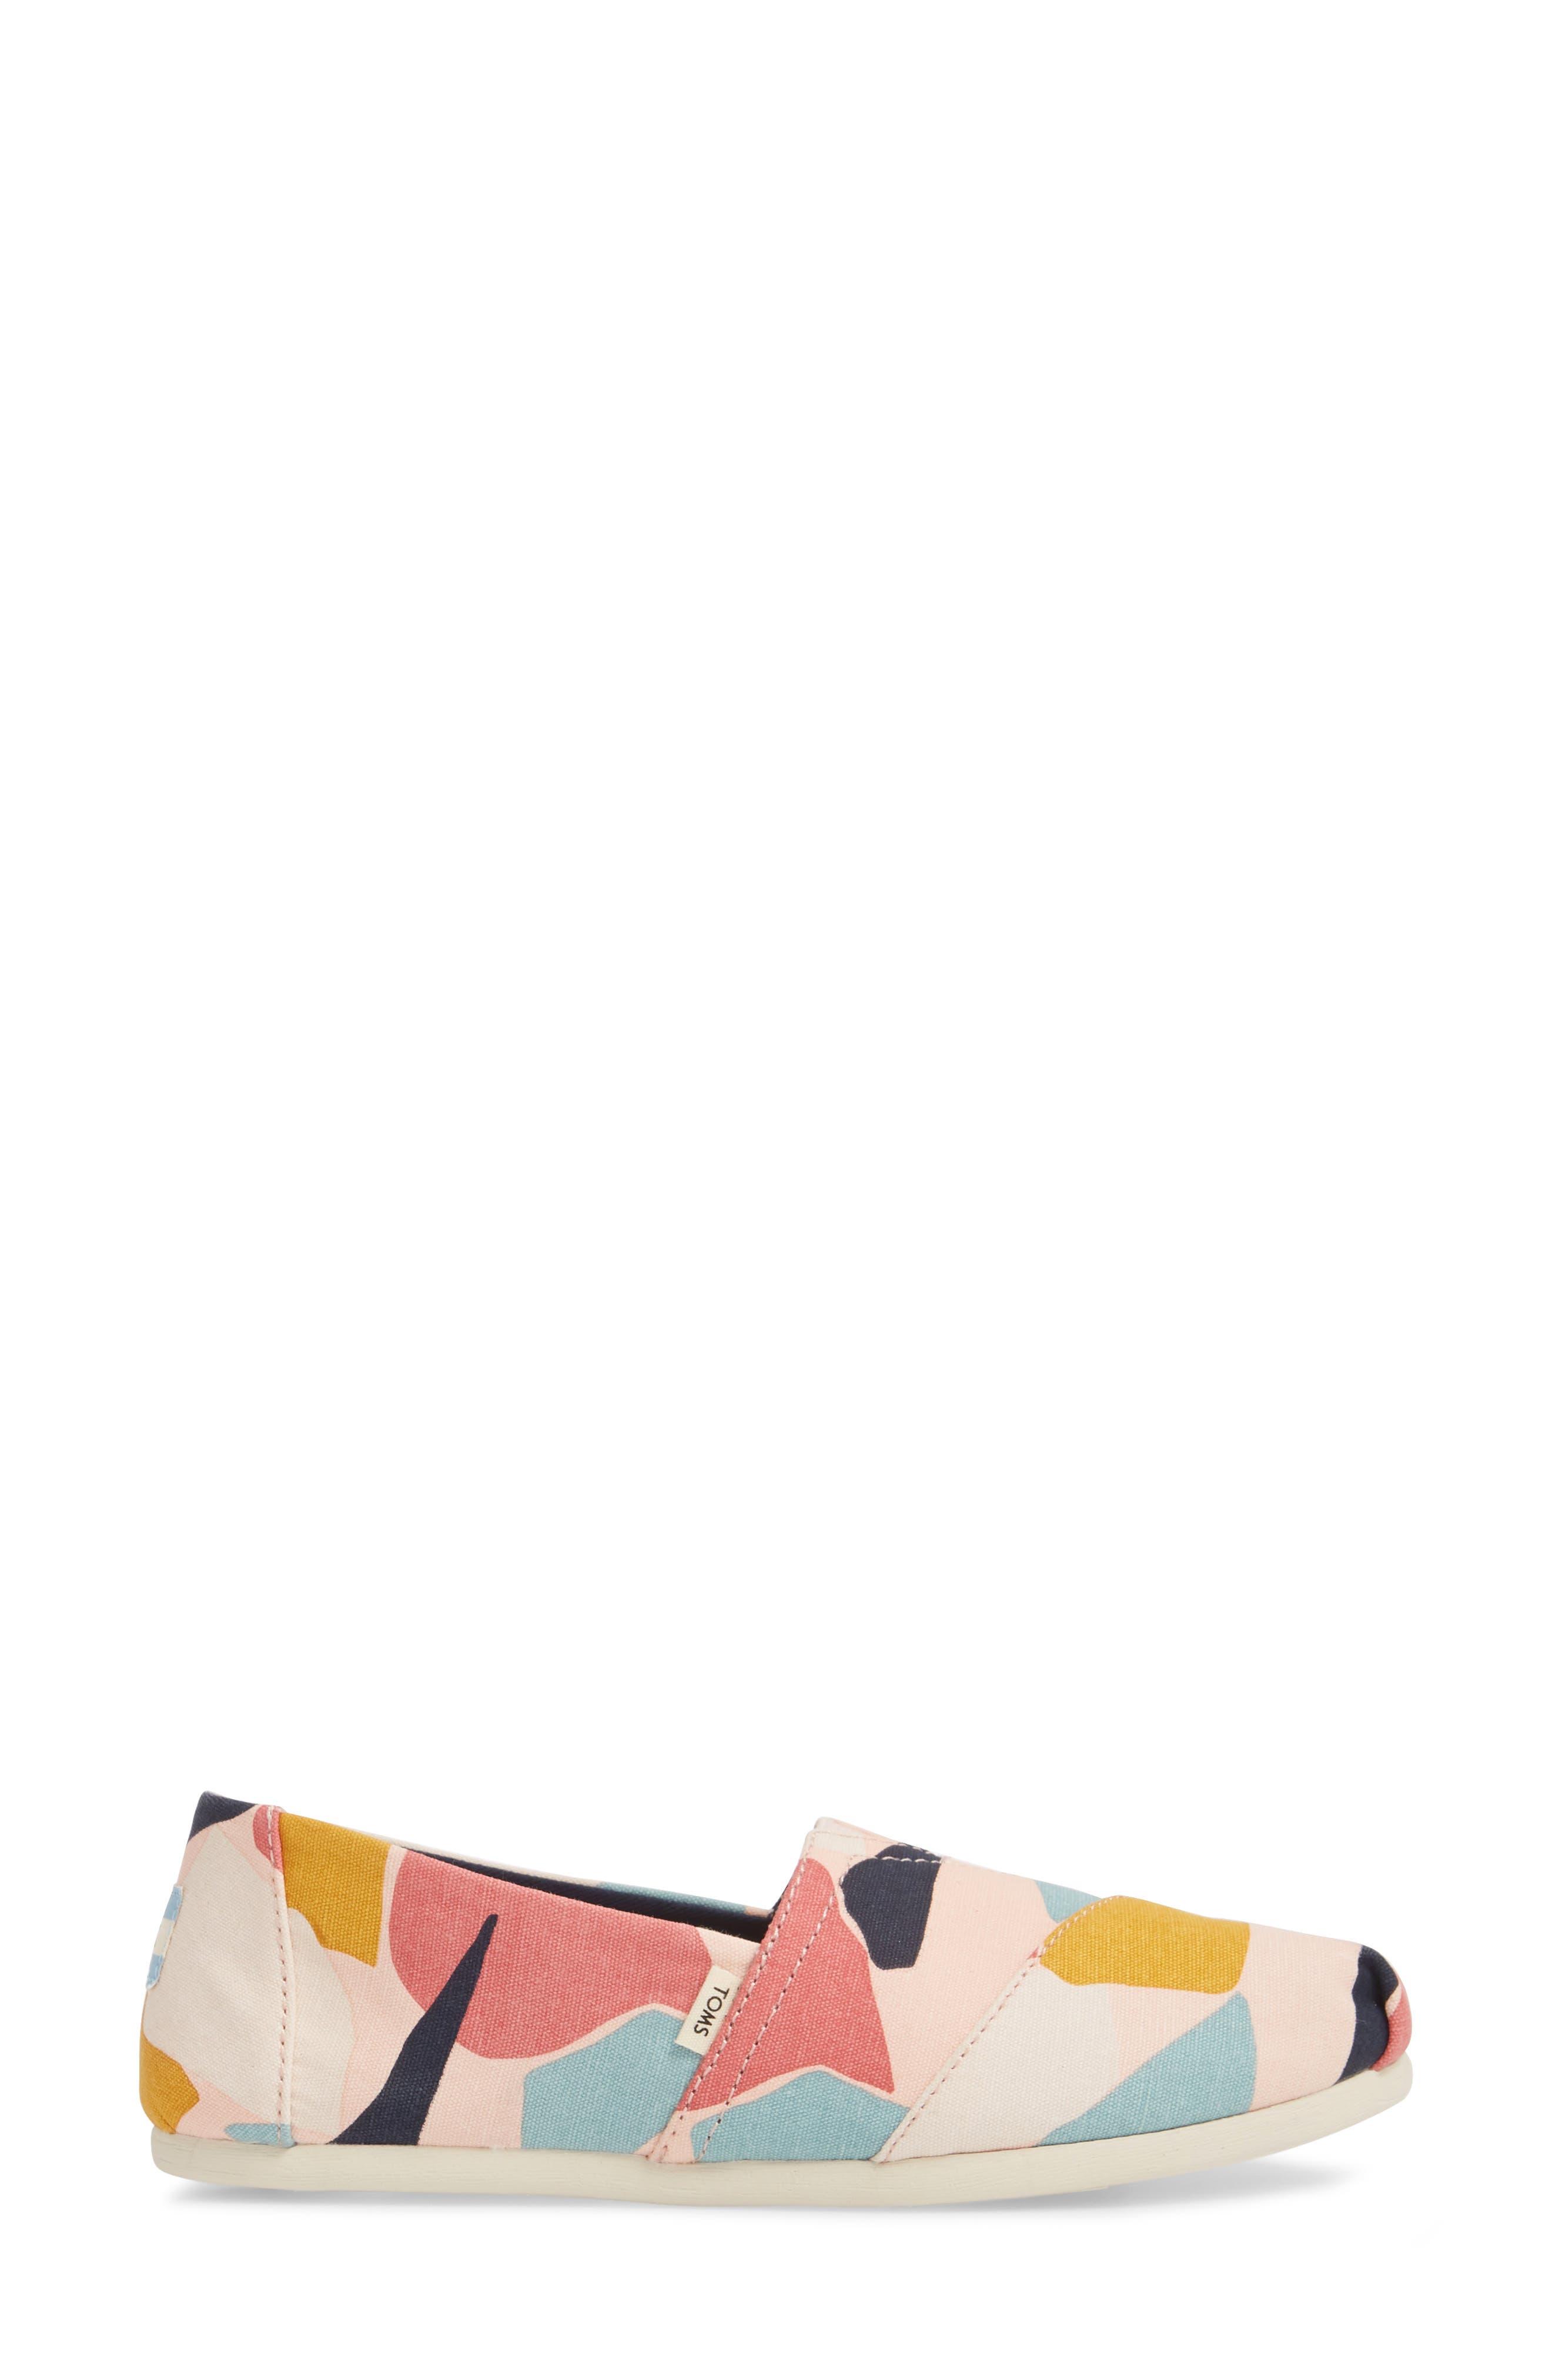 Alpargata Slip-On Sneaker,                             Alternate thumbnail 6, color,                             Rose Glow Print Canvas